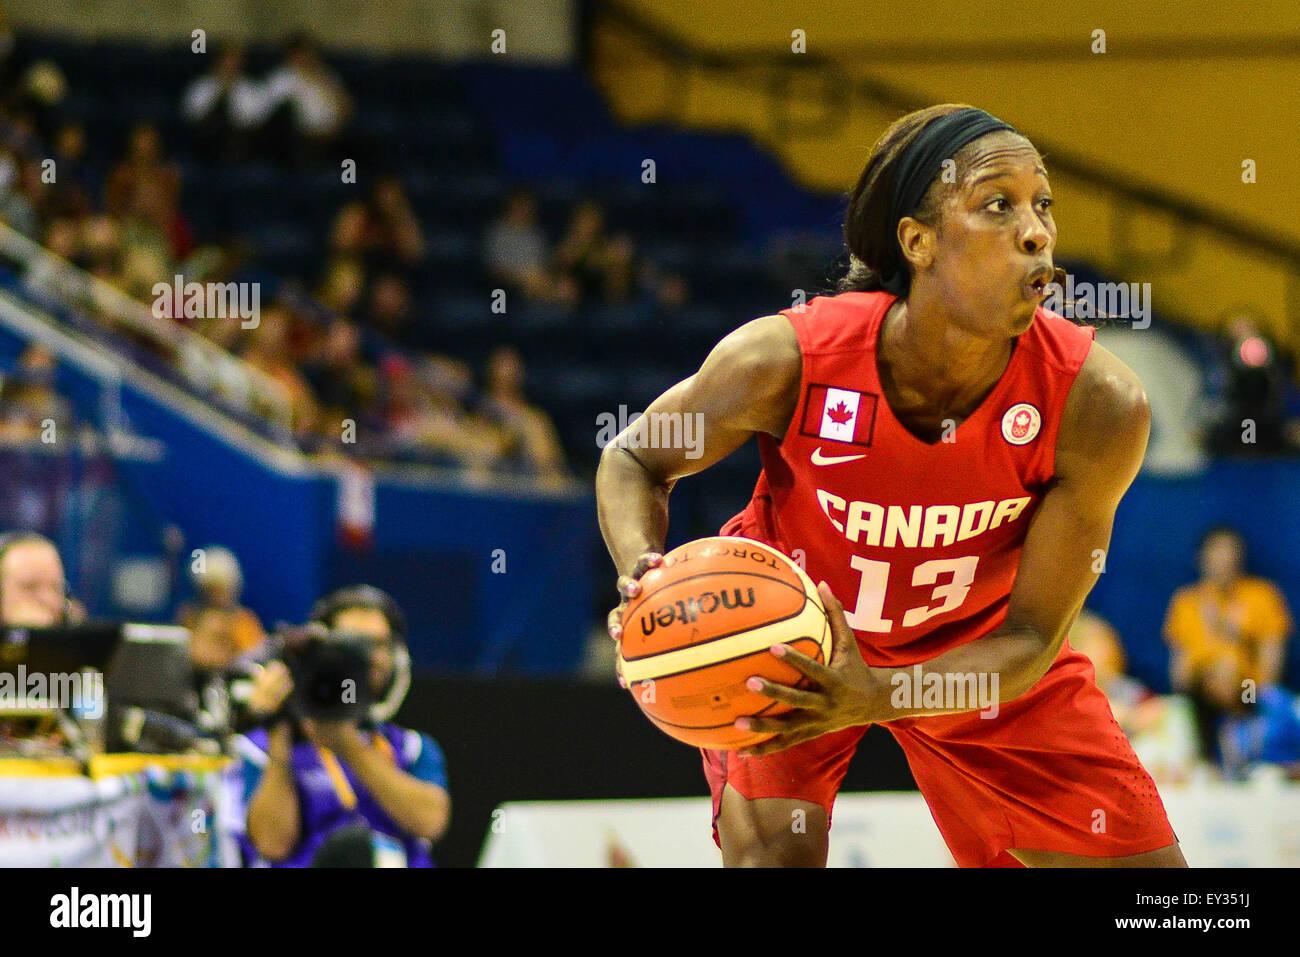 Toronto, Ontario, Canada. 20 juillet, 2015. Tamara Tatham du Canada, cherché un col contre les États-Unis Photo Stock